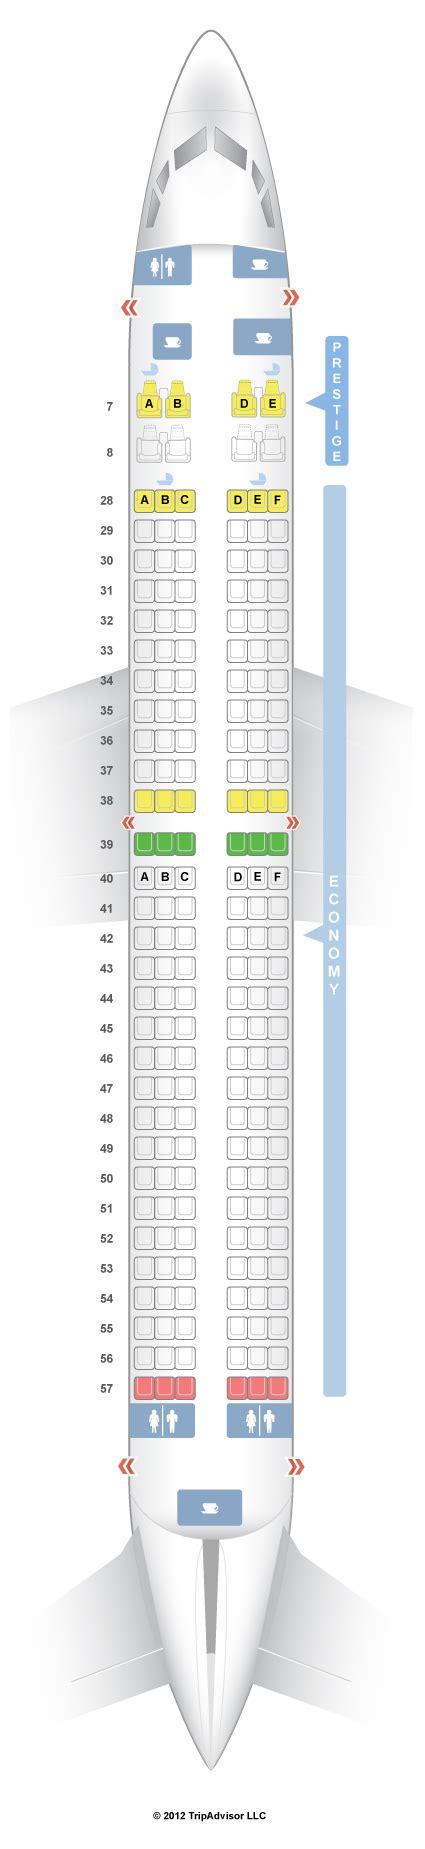 b737 900 config 1 korean air seat maps reviews boeing 737 seat plan brokeasshome com